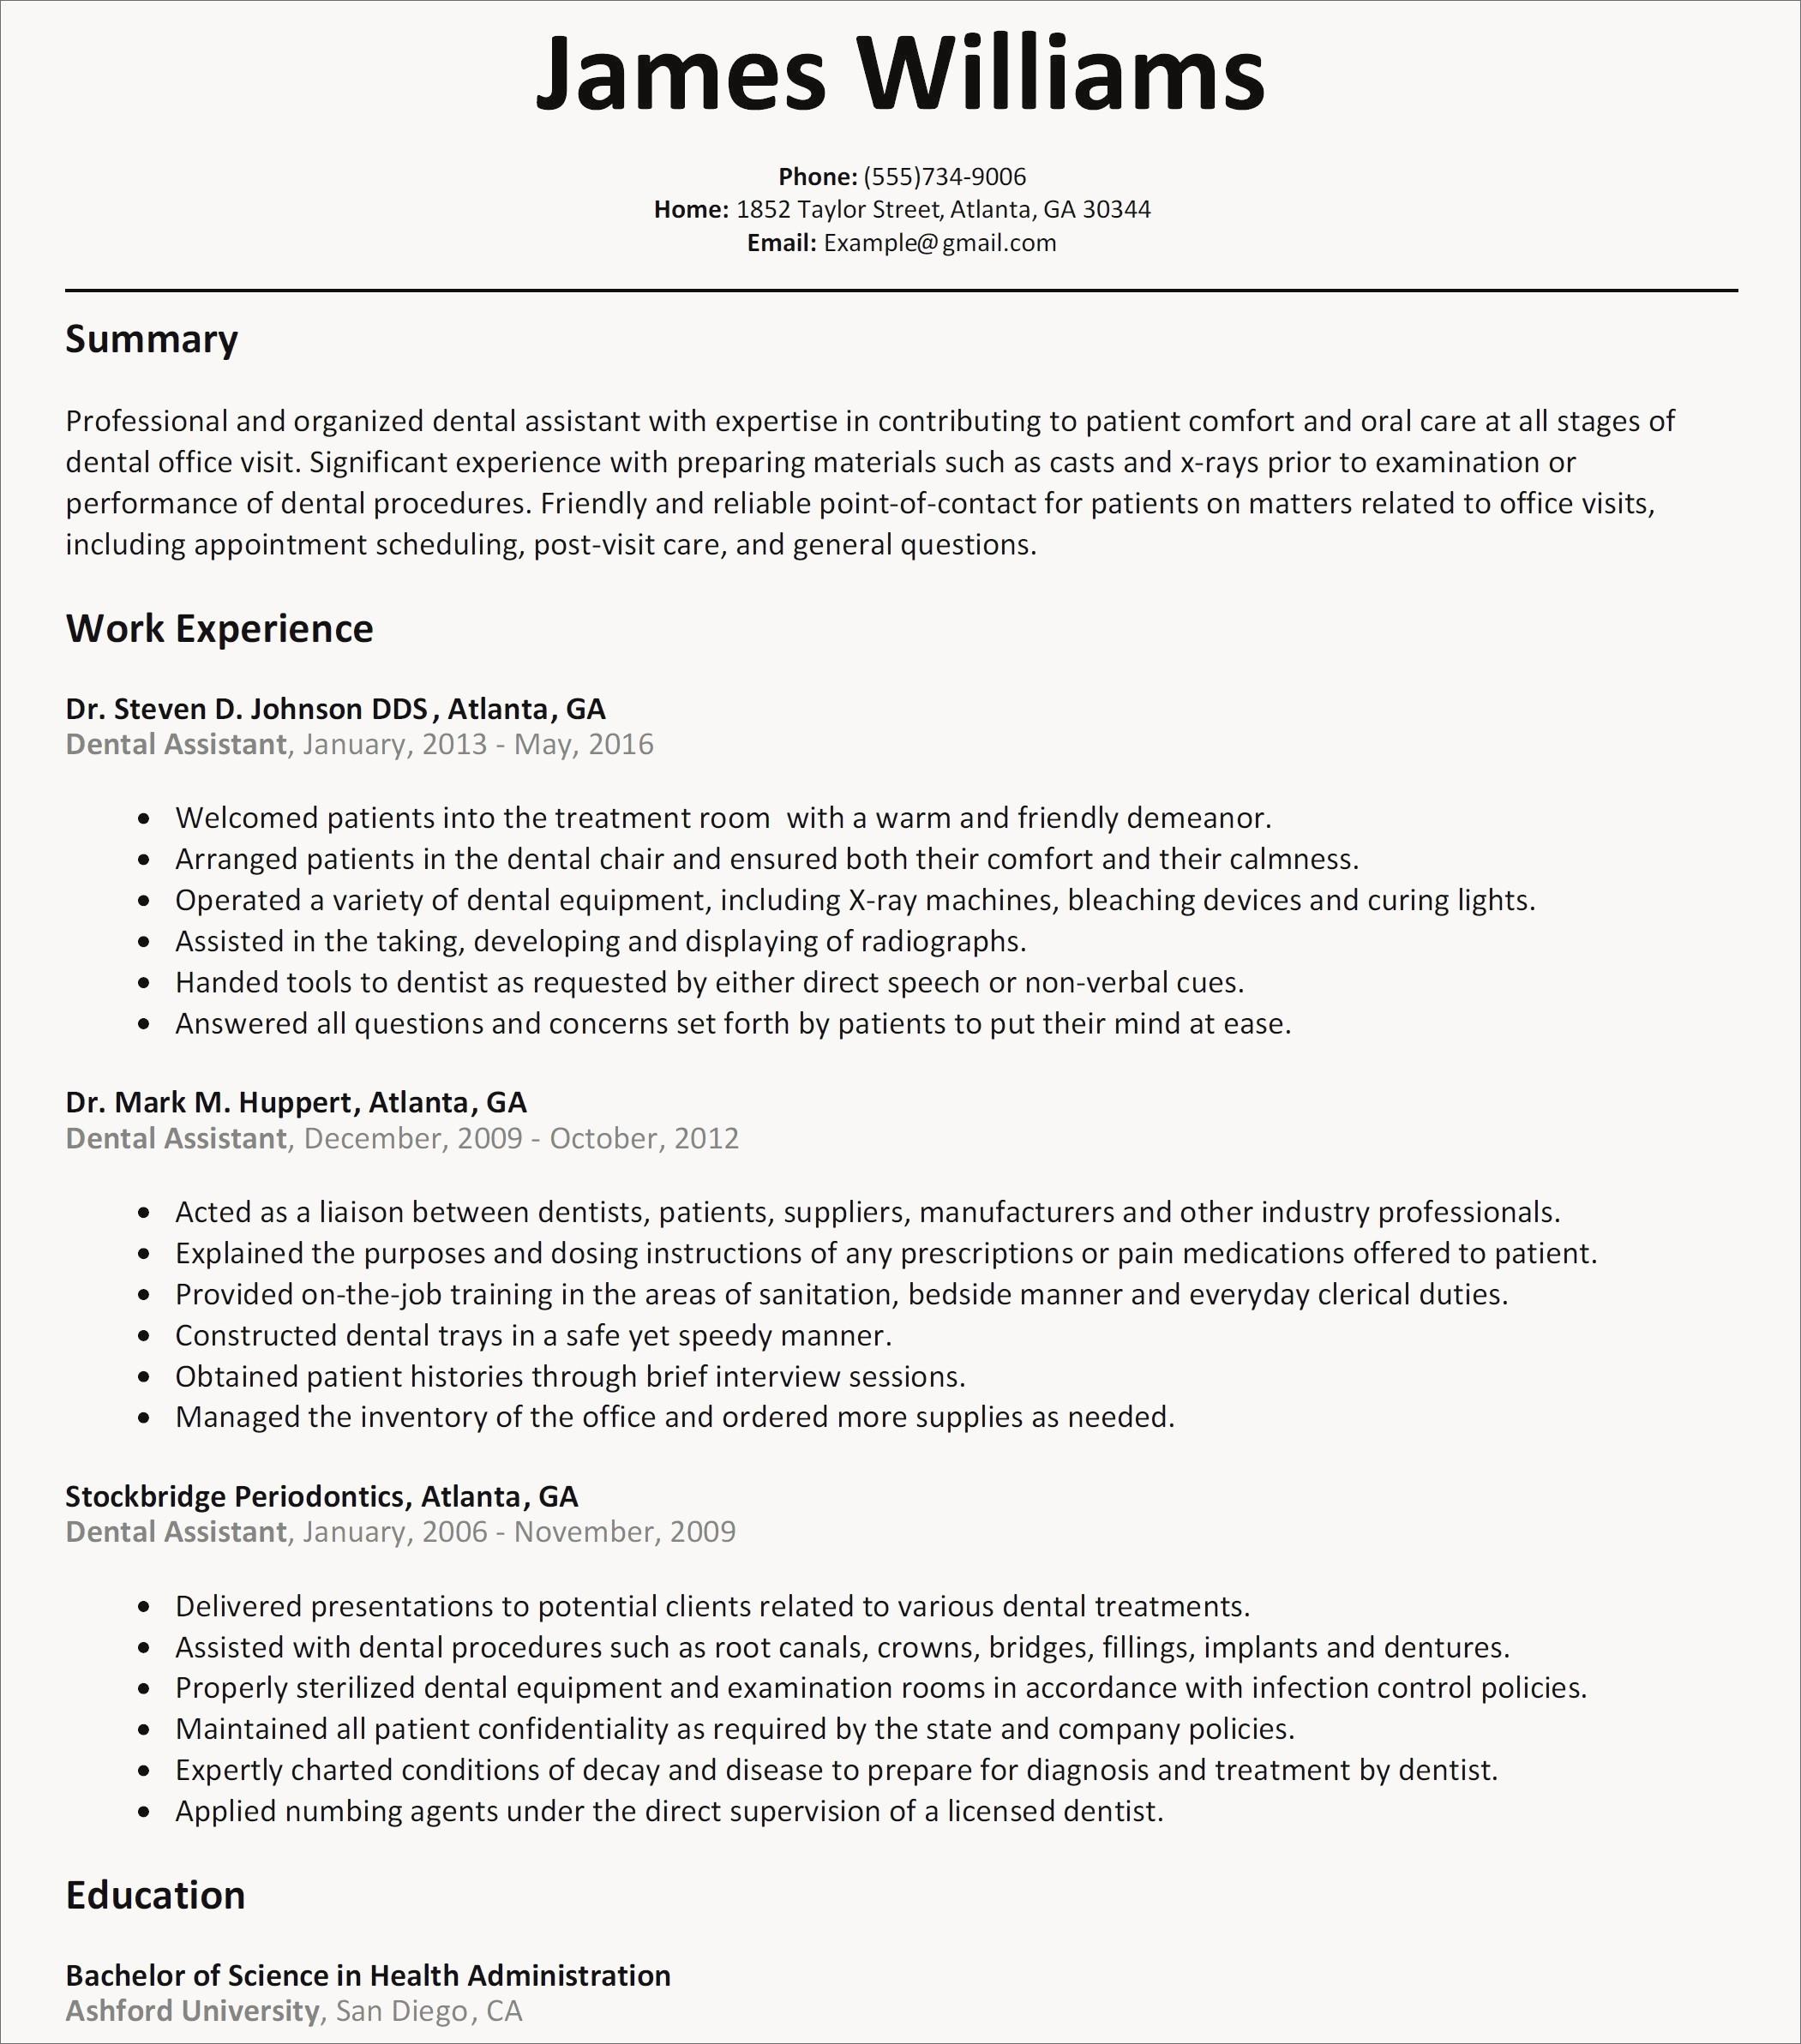 Resume Objective Example Receptionist Resume Objective Sample Resume Objective Examples Dental Receptionist Inspiring S Of Receptionist Resume Objective resume objective example wikiresume.com